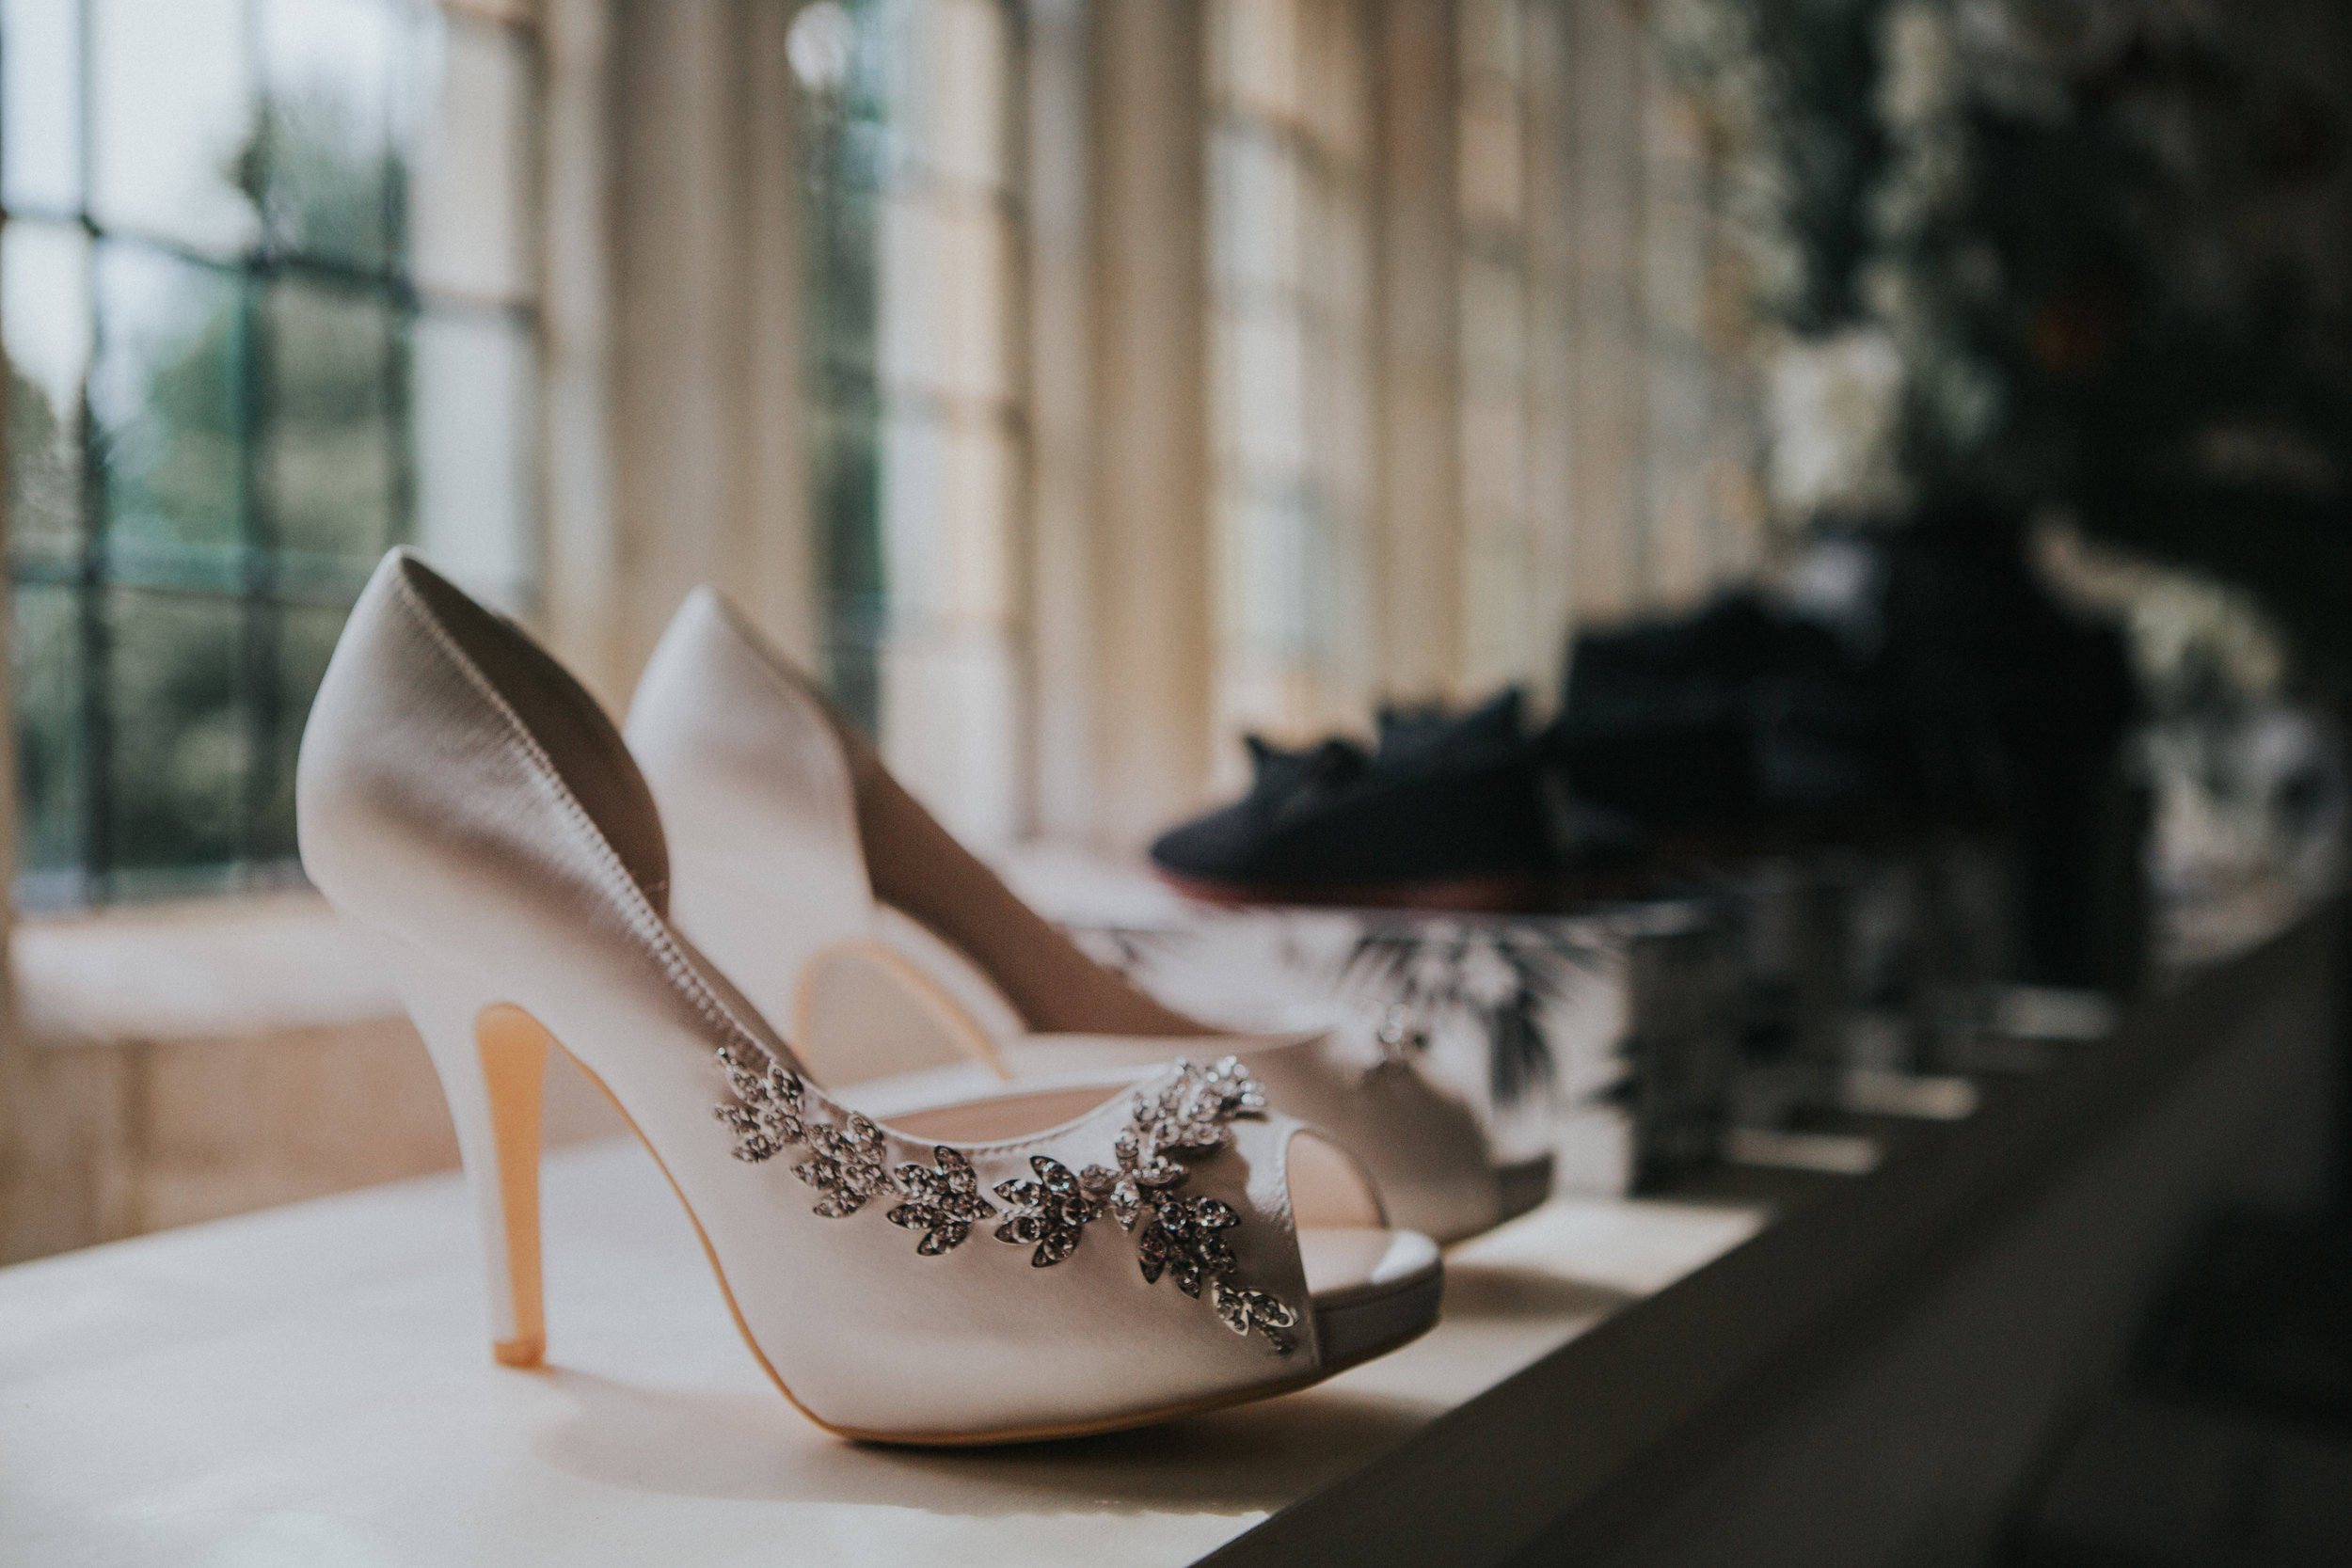 westenhangar-castle-kent-london-wedding-photography-bridal-prep-shoes-07